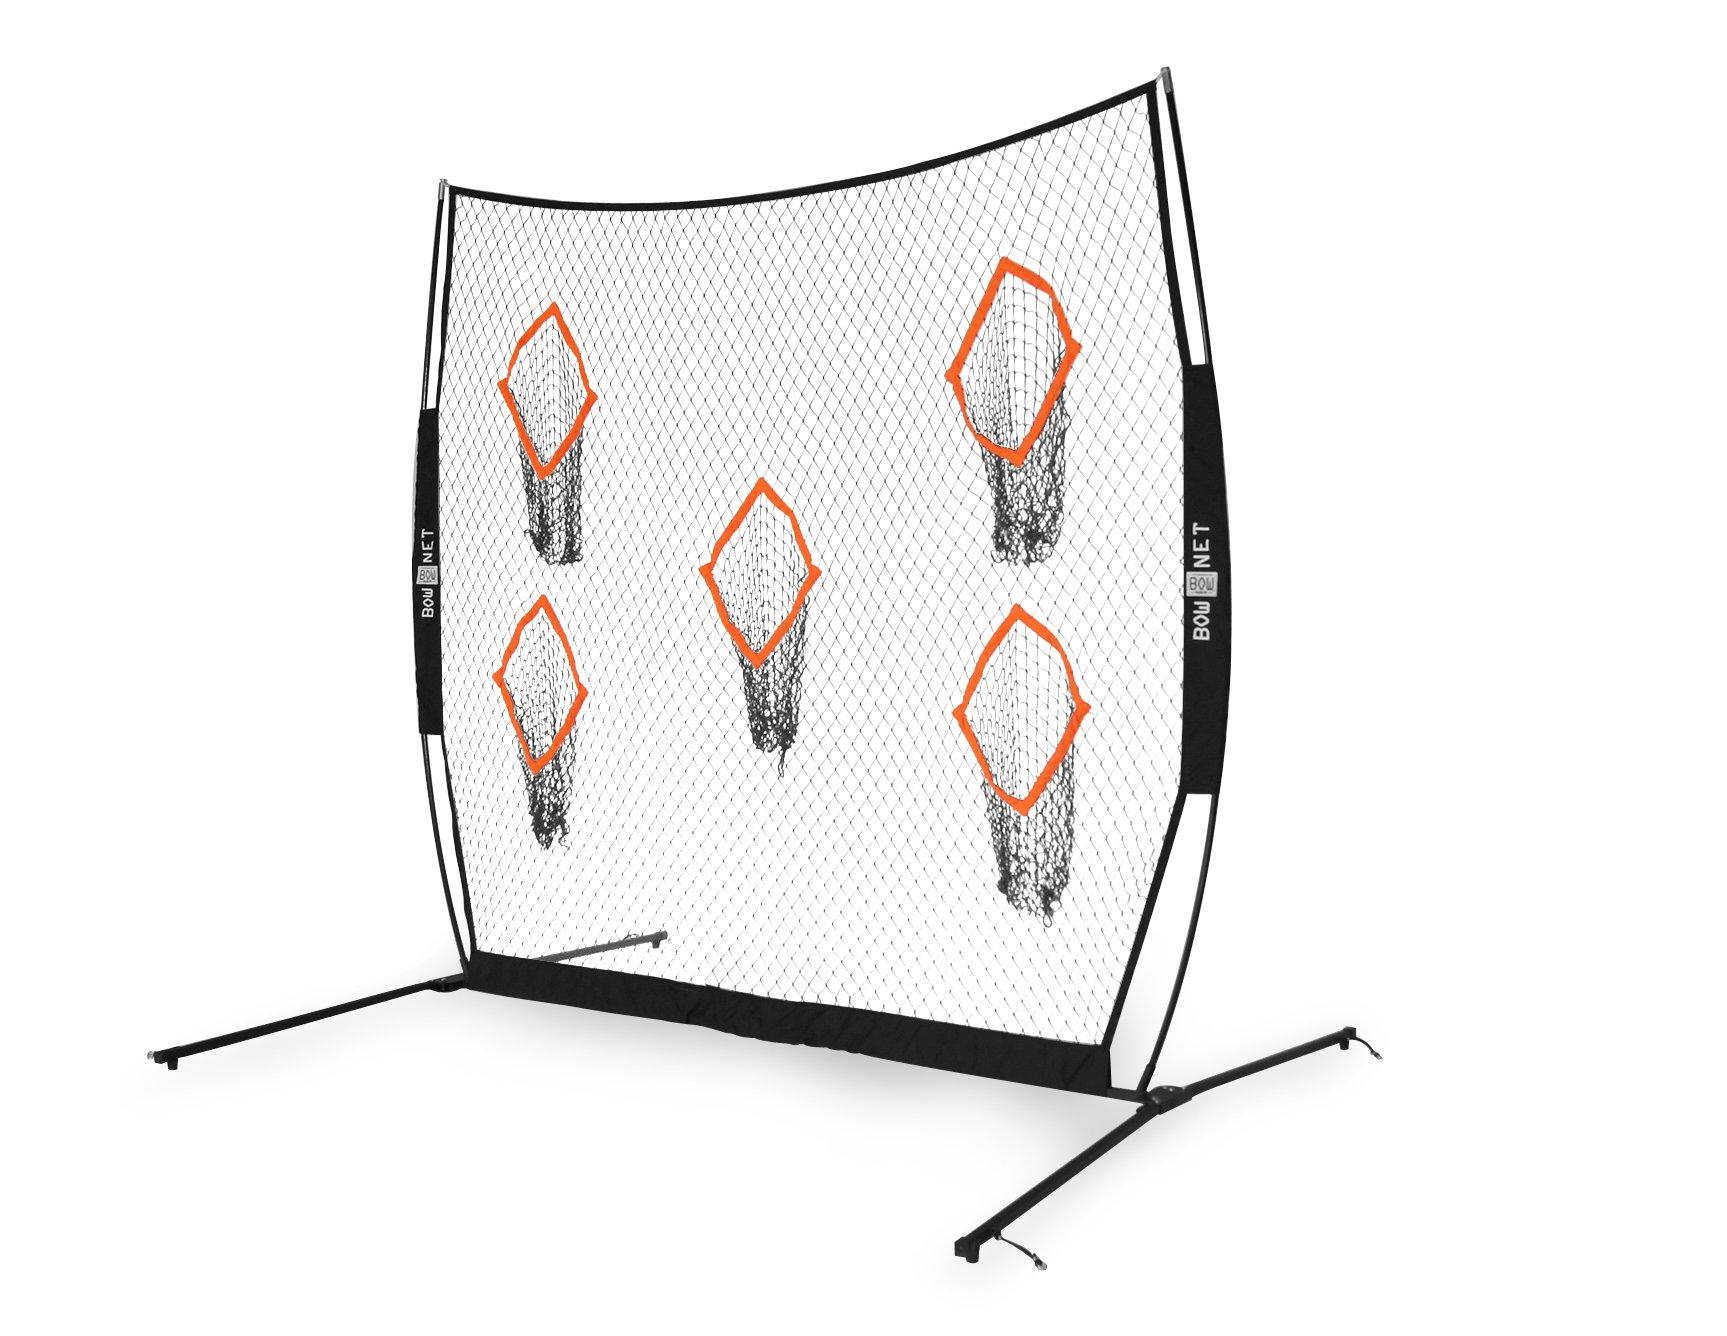 Bownet 8' x 8' Soccer Goal Target Net with 5 Scoring Zones - Soccer Pocket Targets Help Visualize Shots